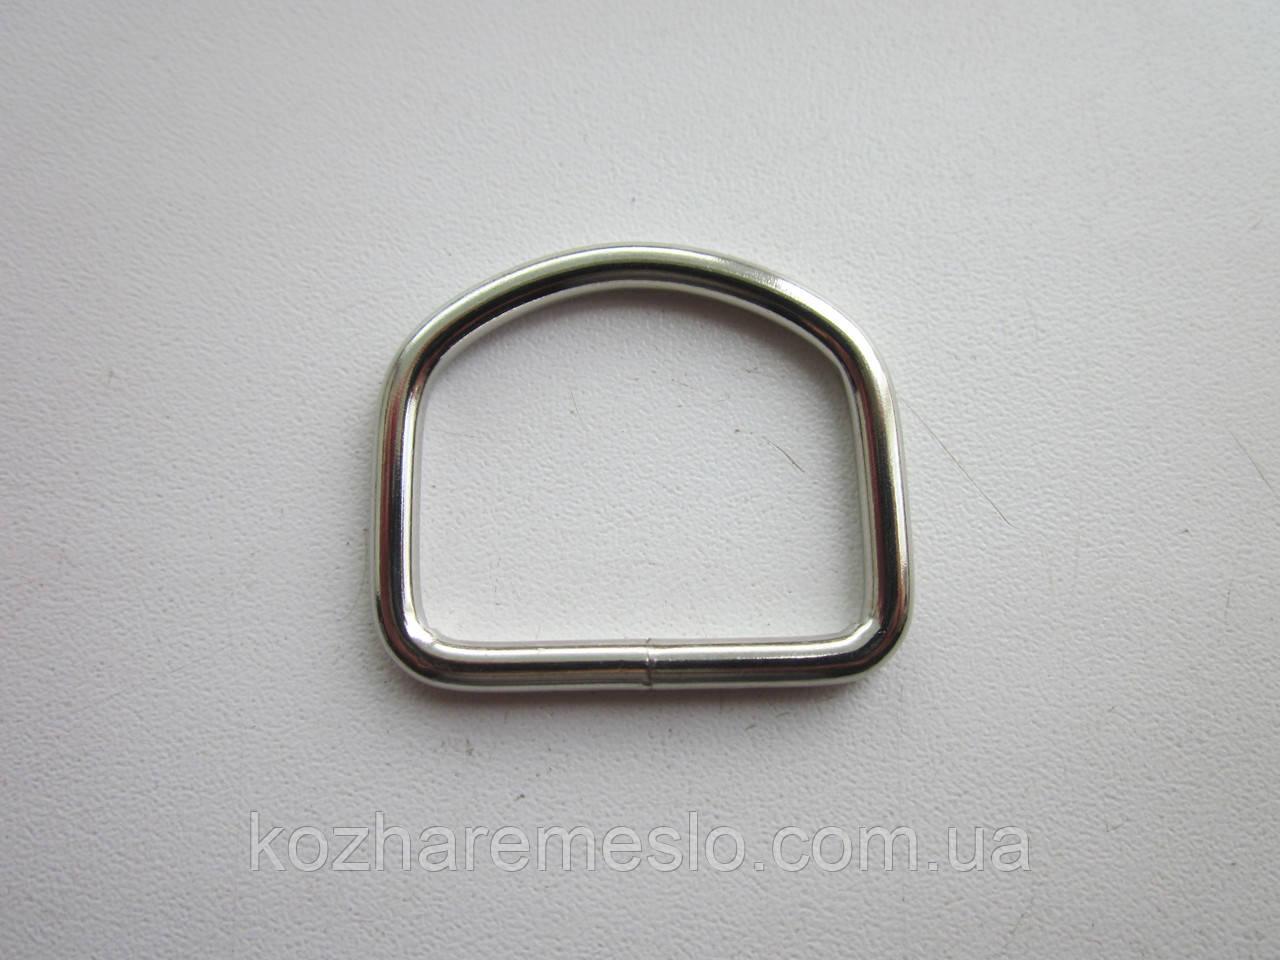 Полукольцо 3,5 х 30  х 25 мм никель